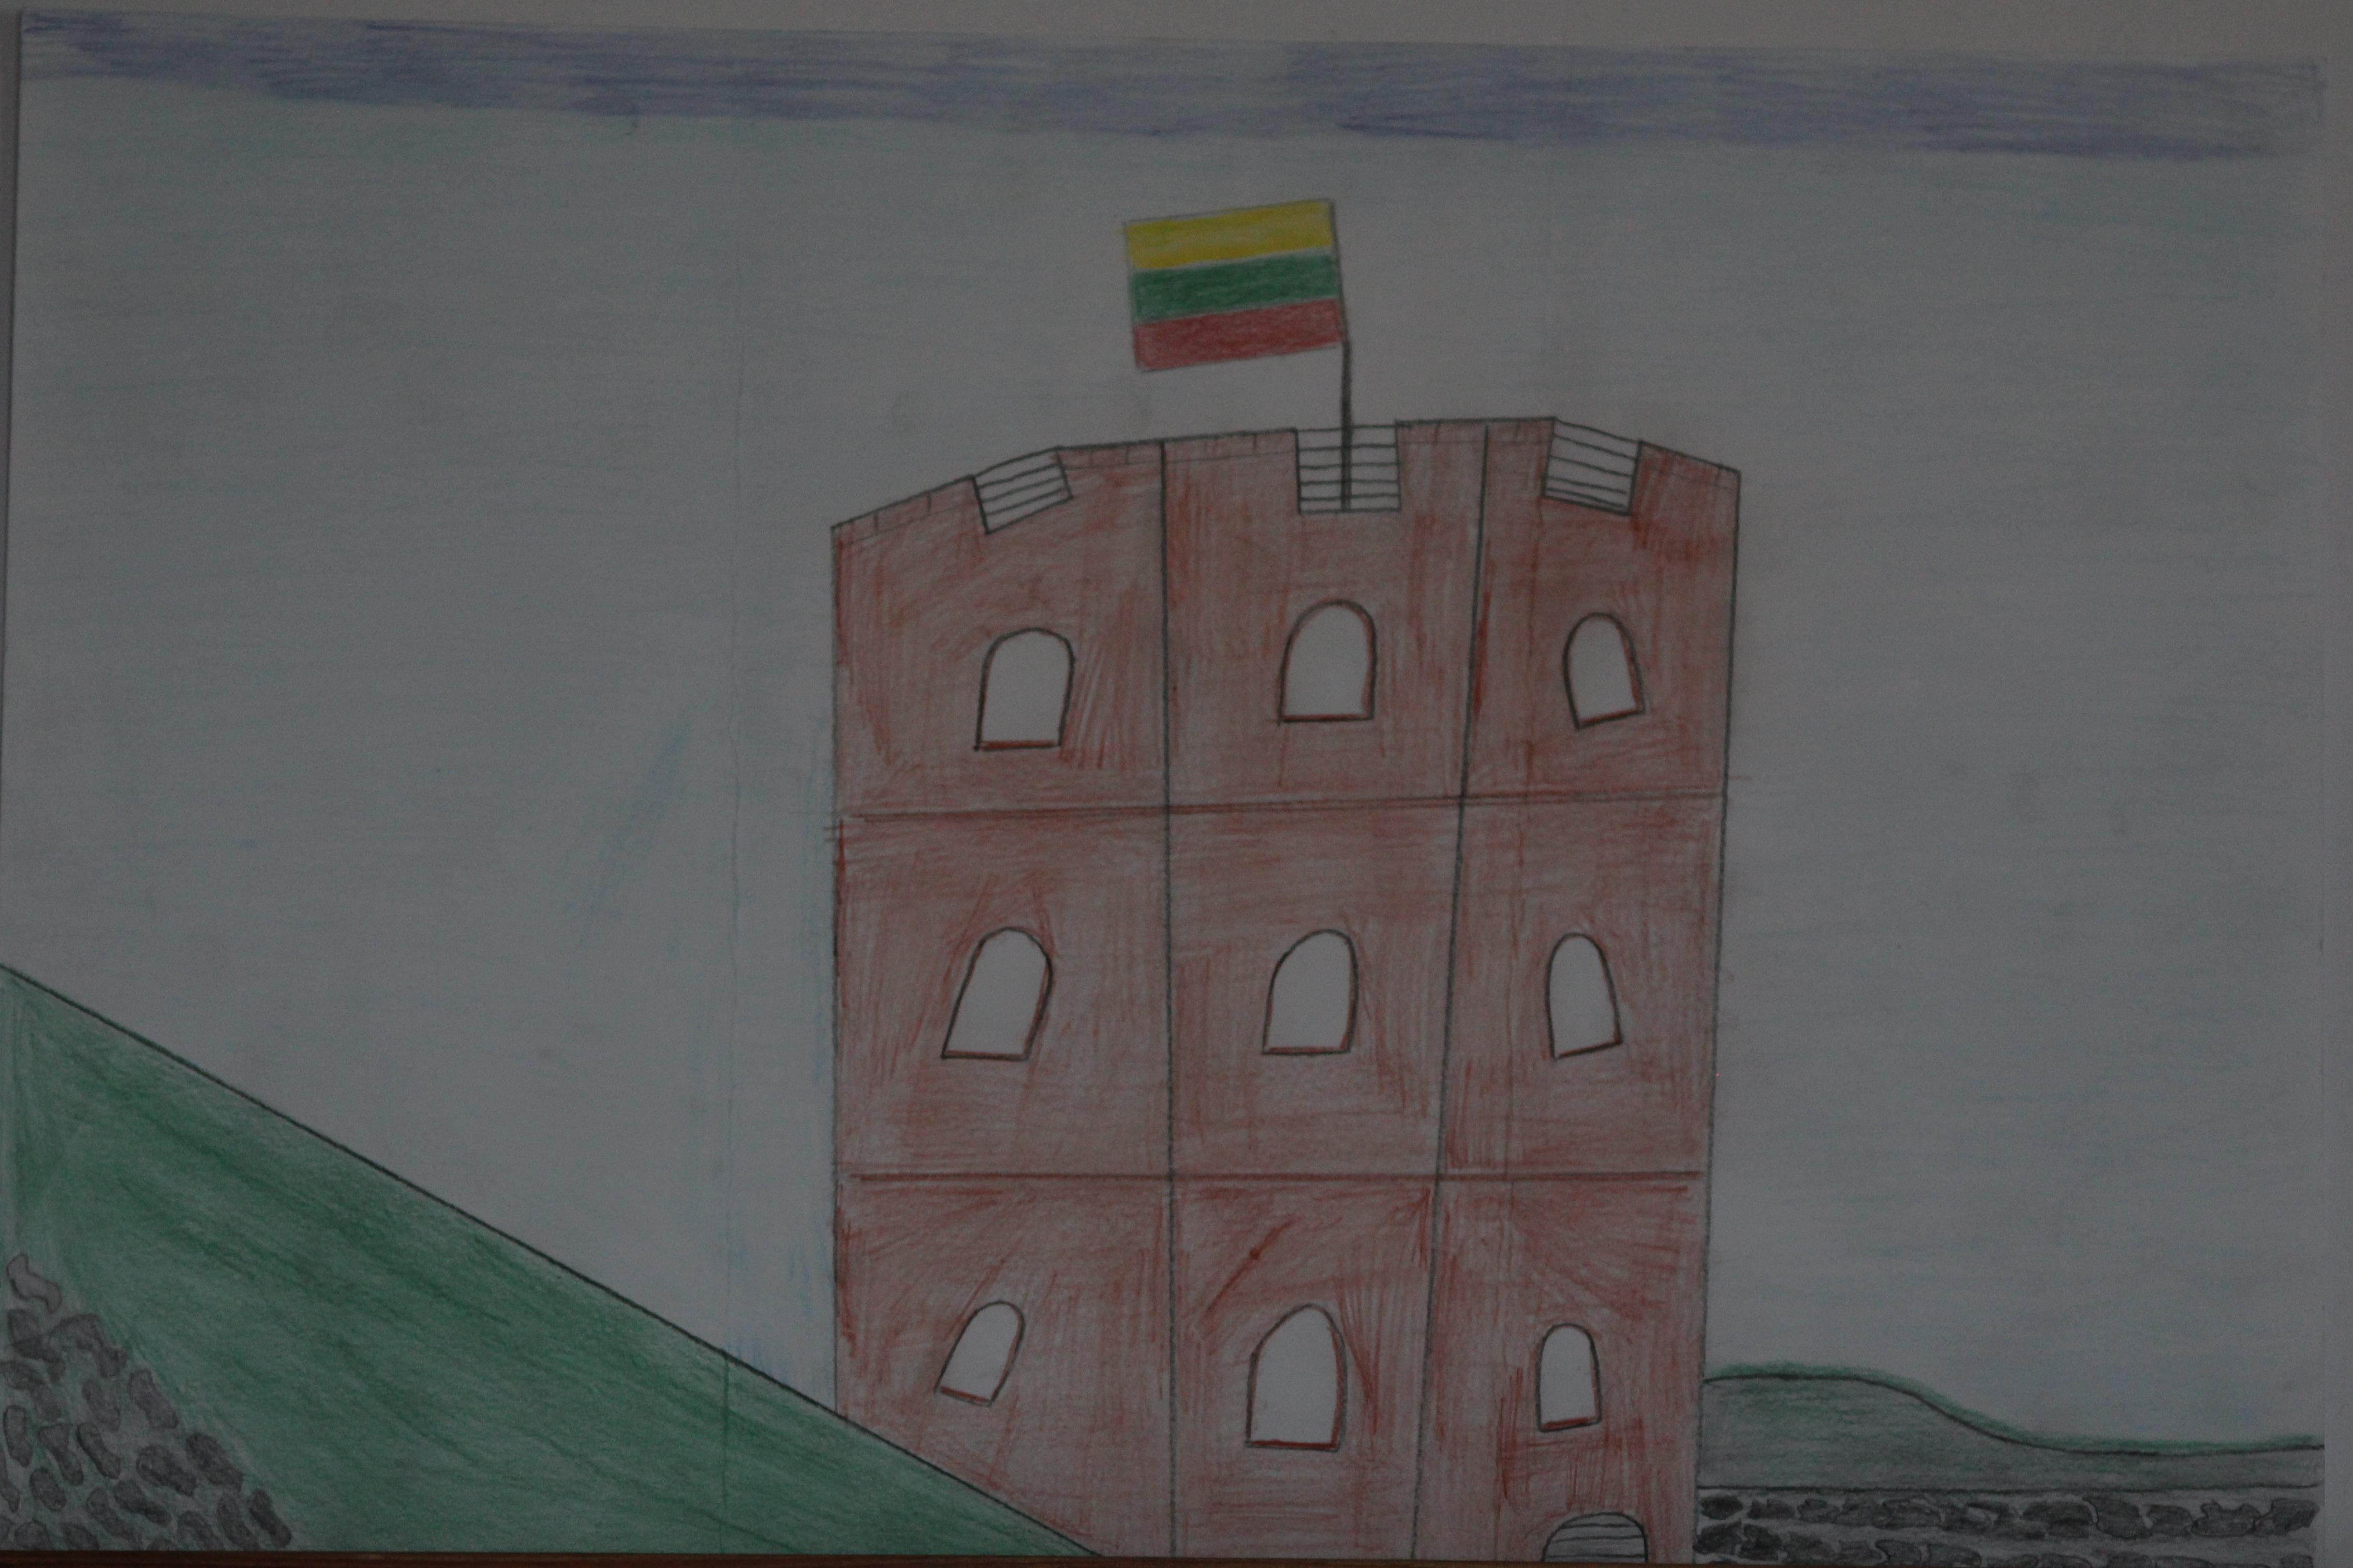 Konstantin Cybakov, 8 metai, Klaipėda